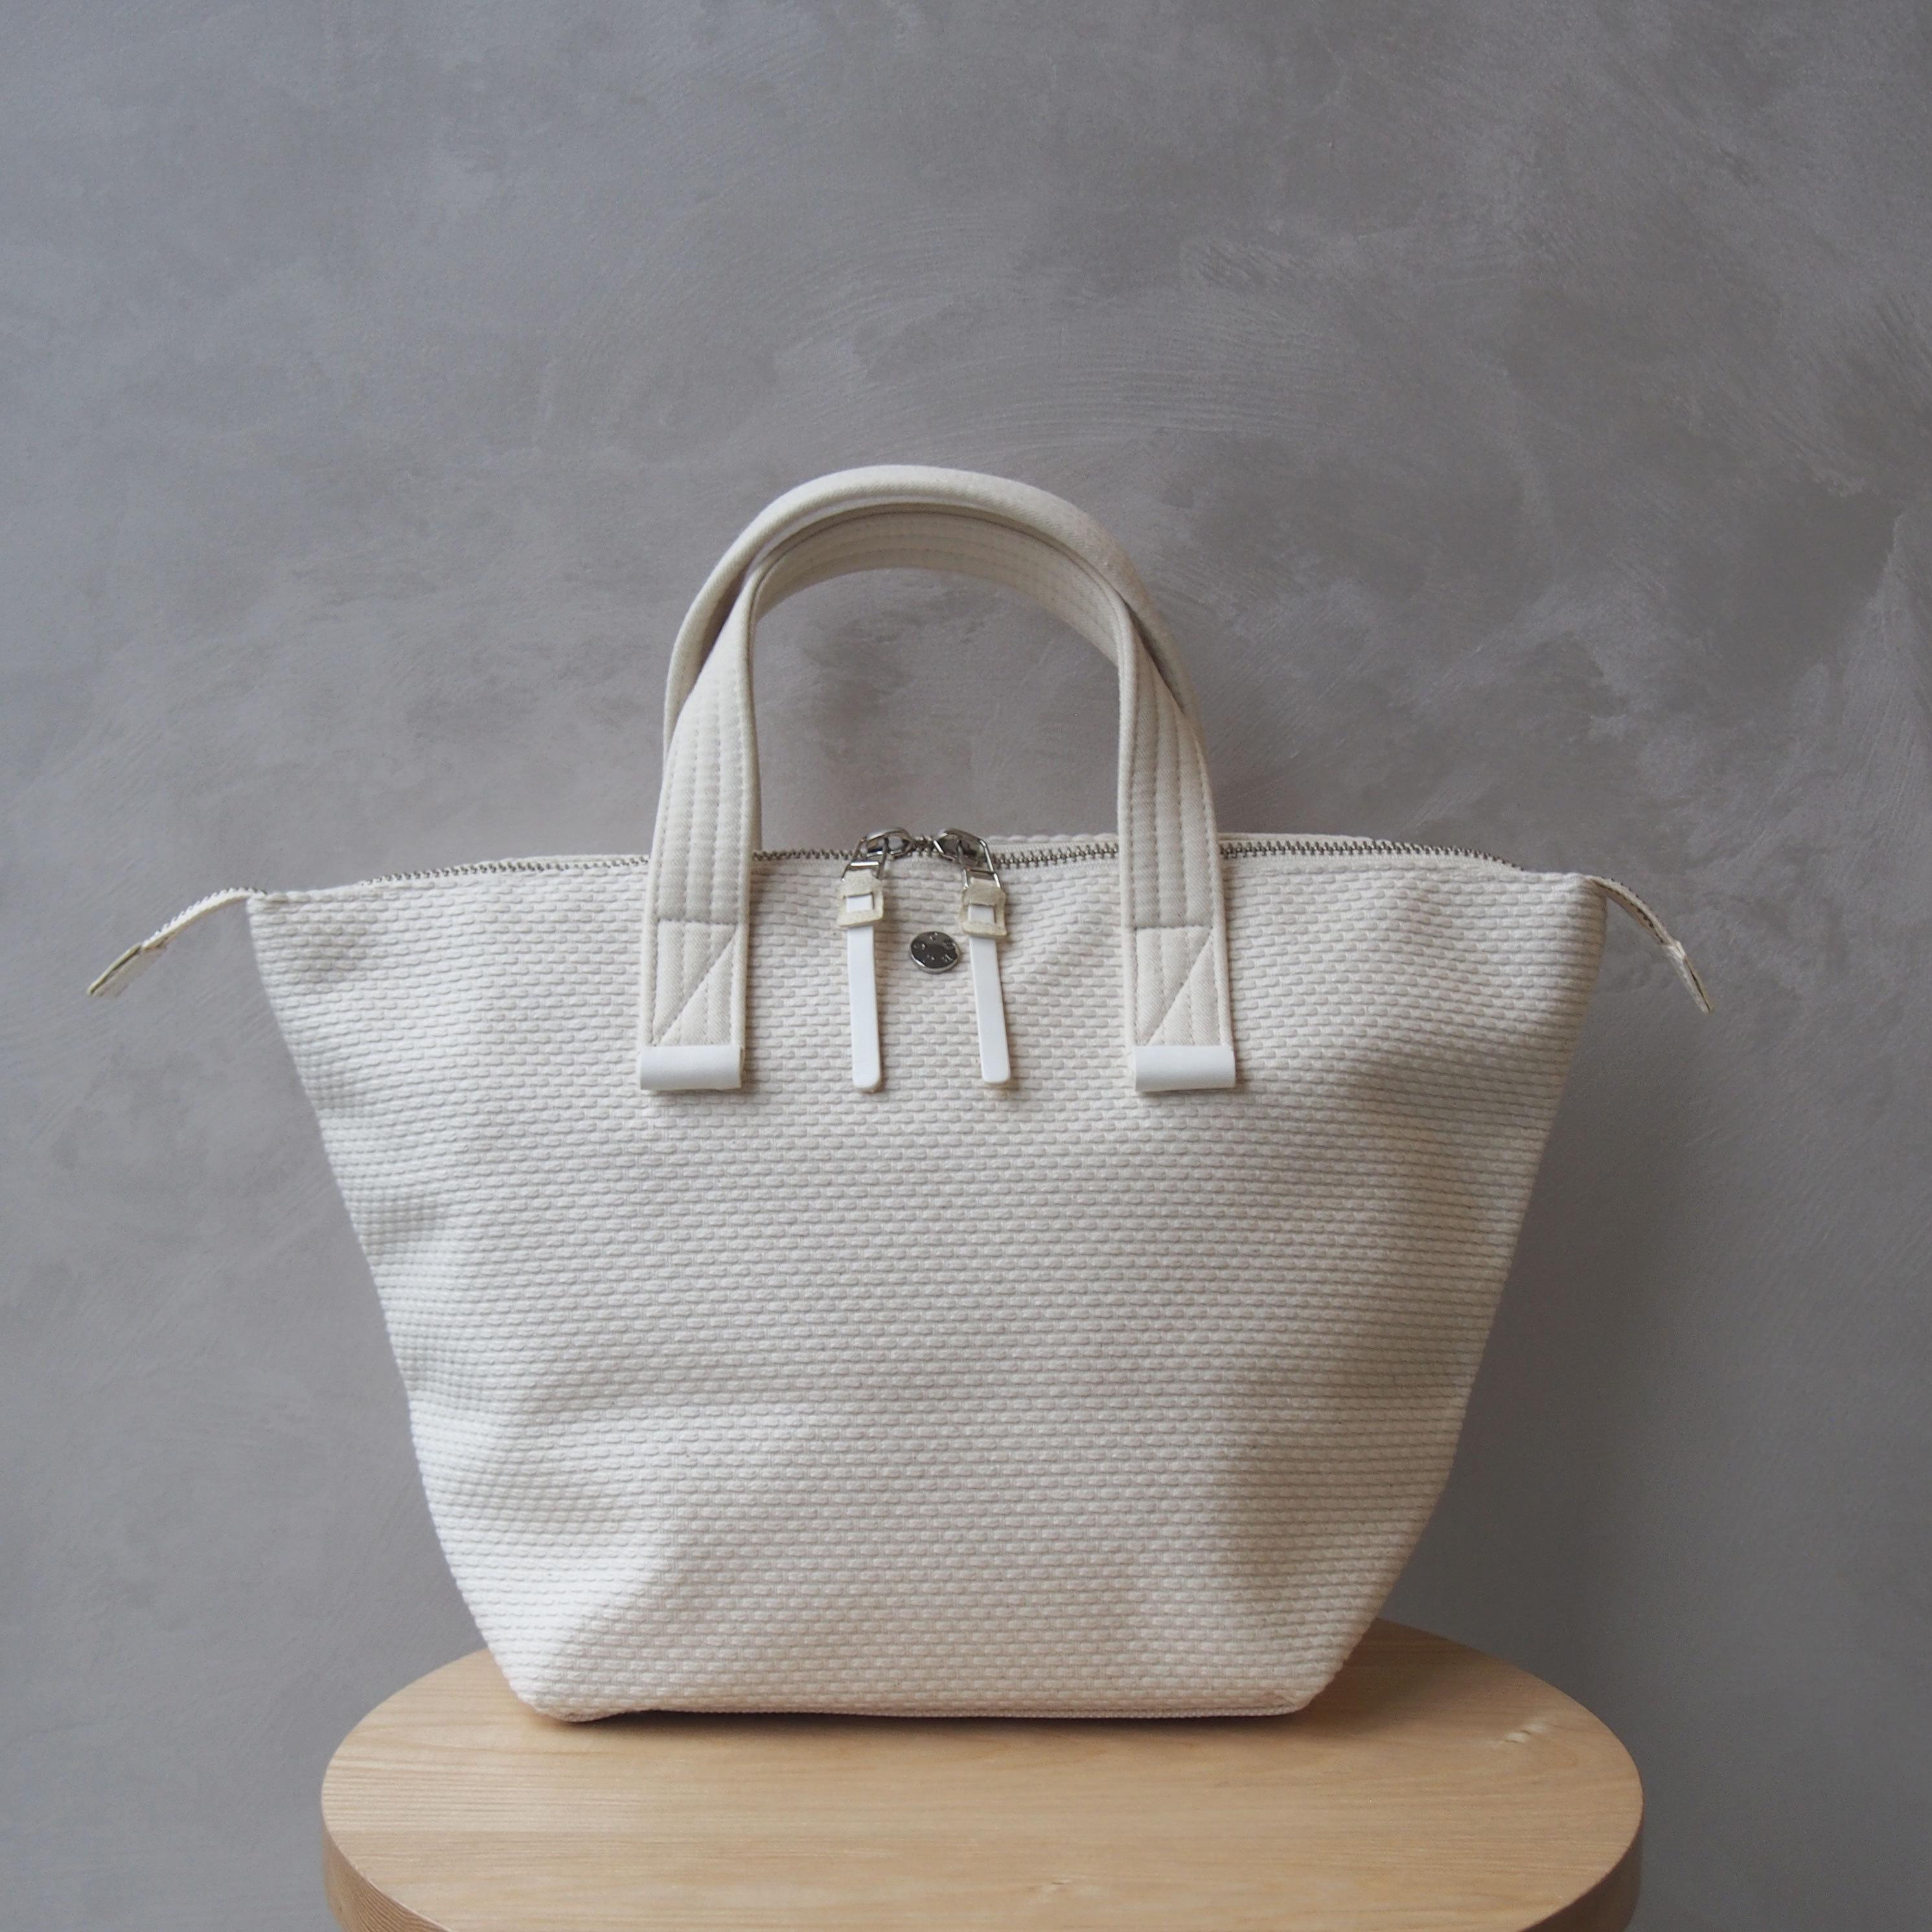 CaBas N°33 Bowler bag small White/White